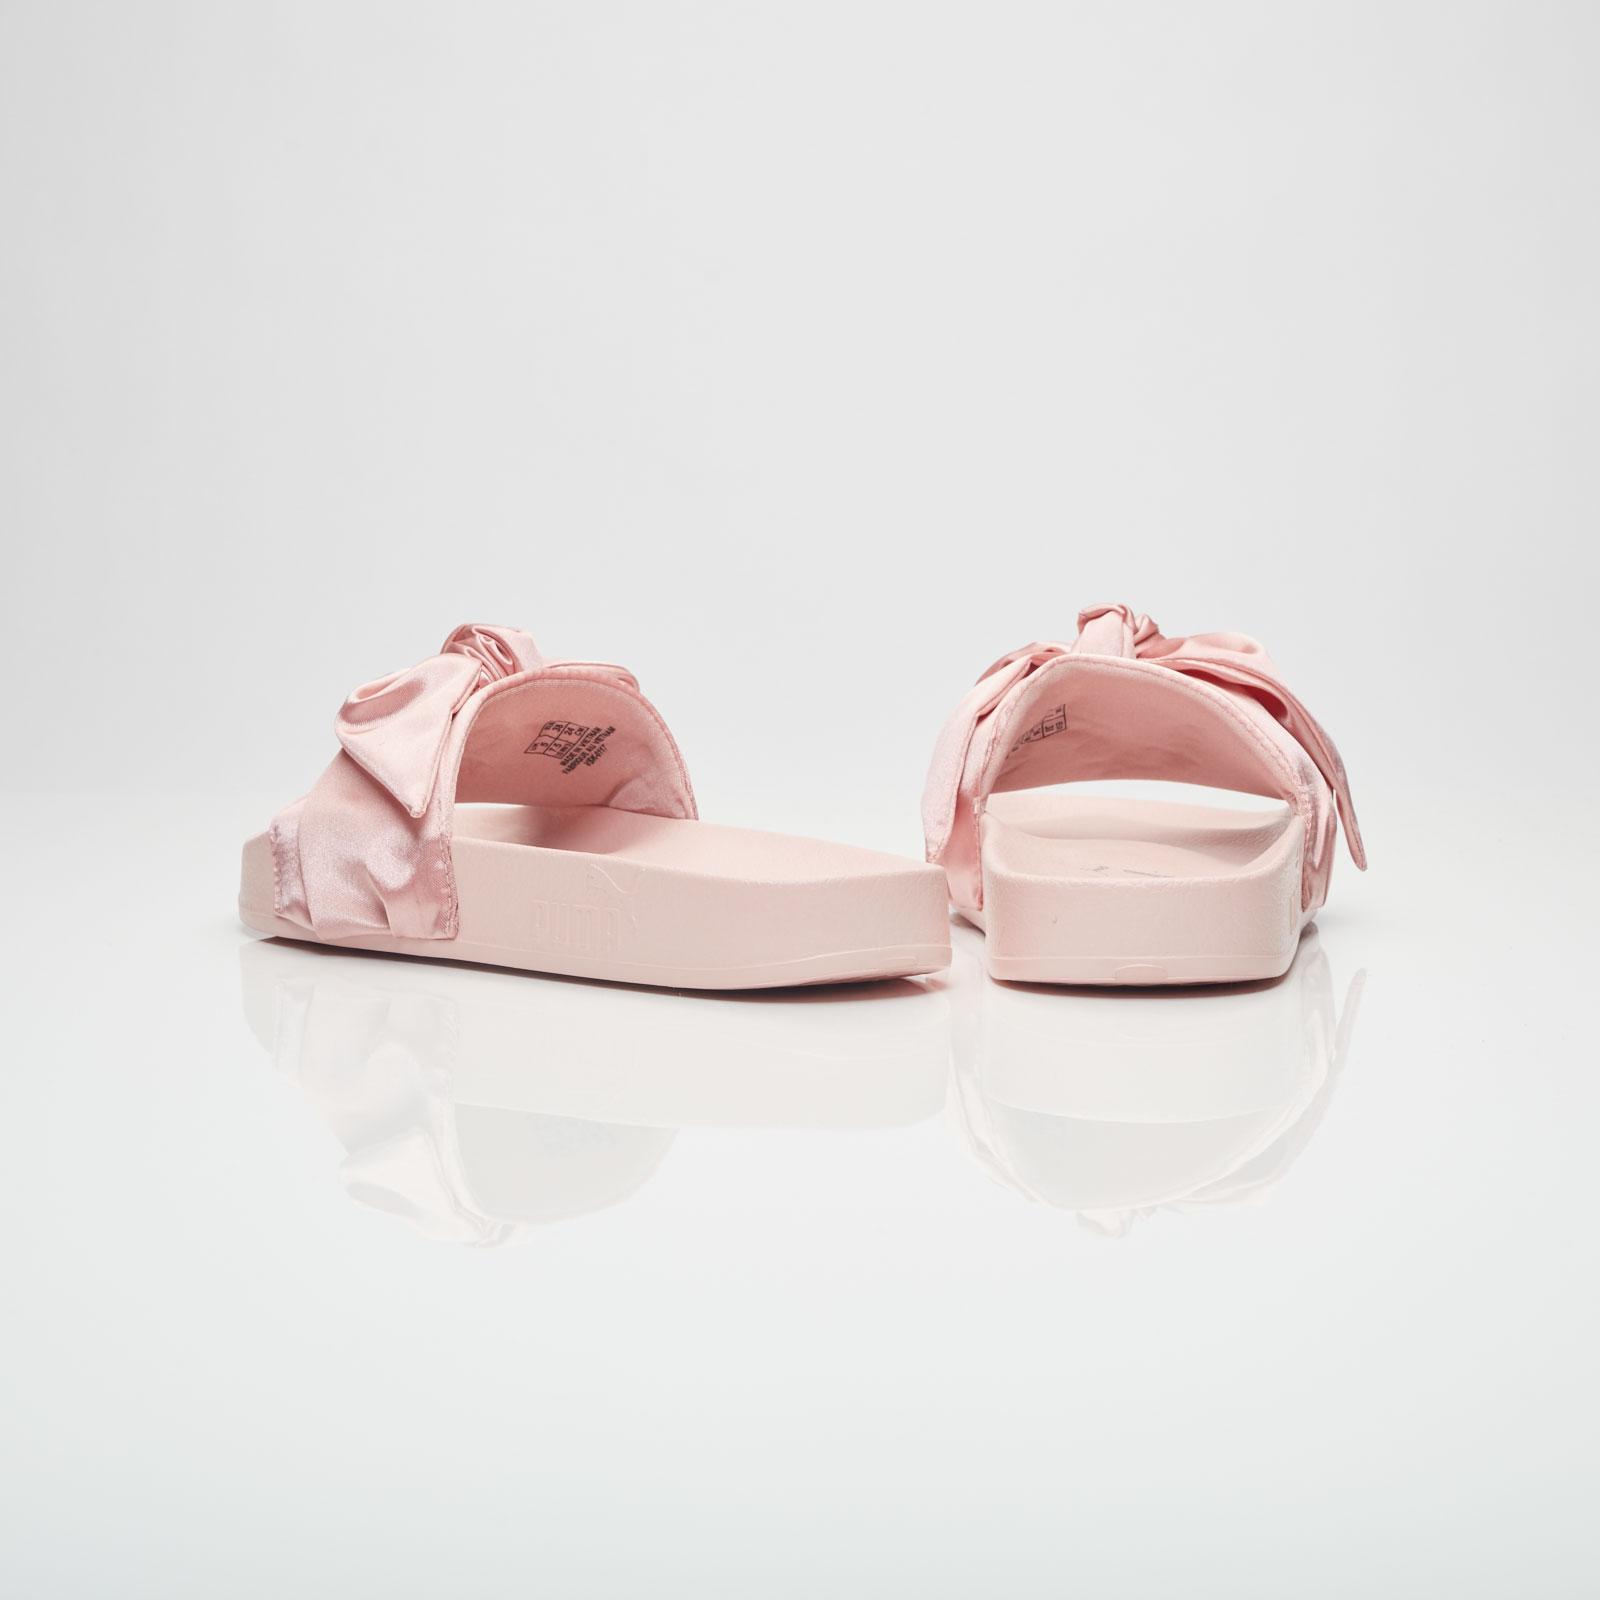 96911e665c48 Puma Bow Slide Women - 365774-03 - Sneakersnstuff